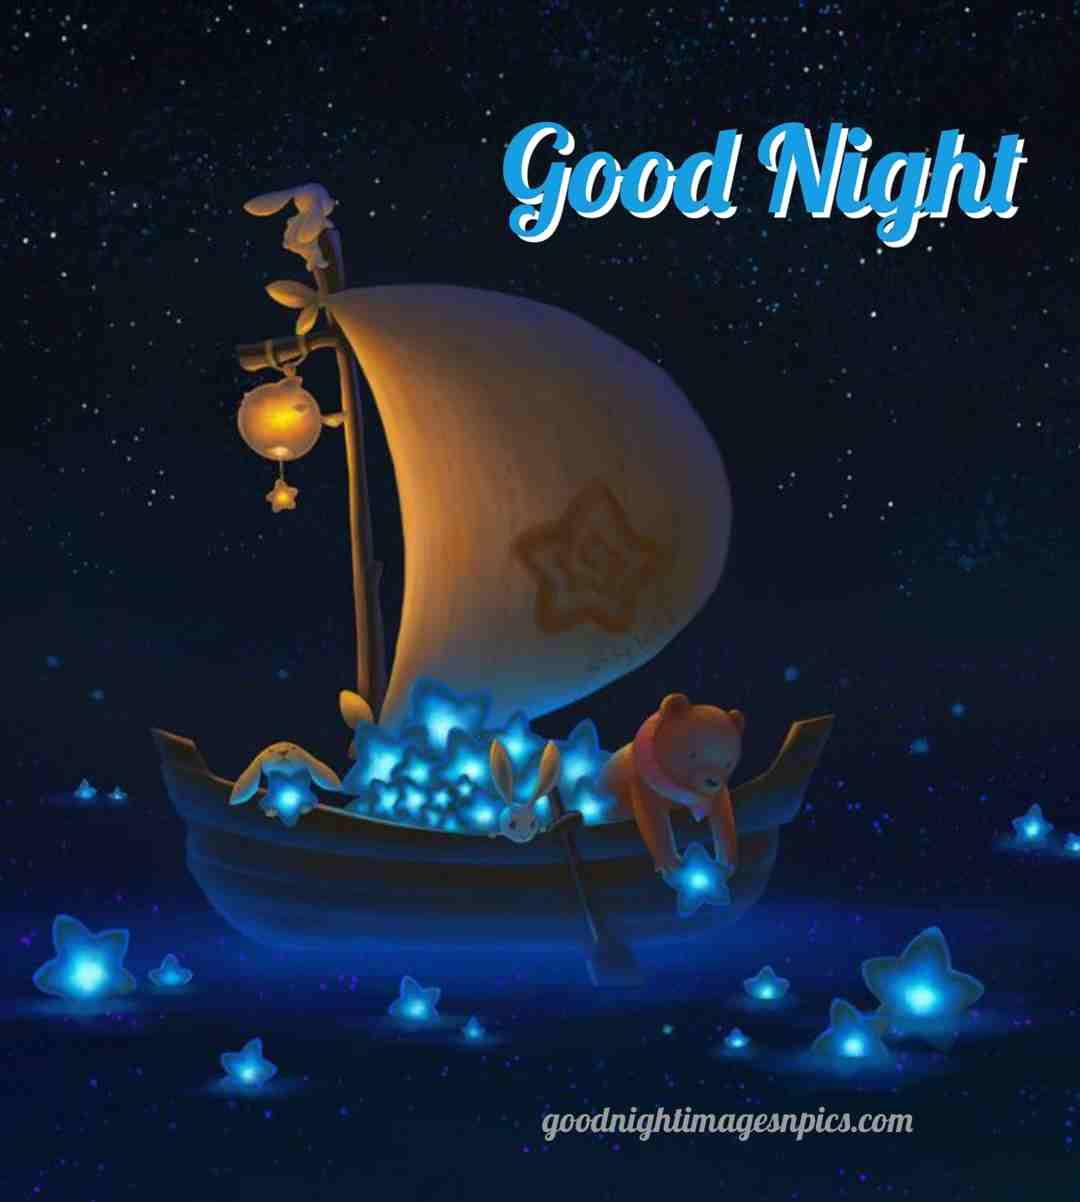 Good night GIF imnage for whatsap